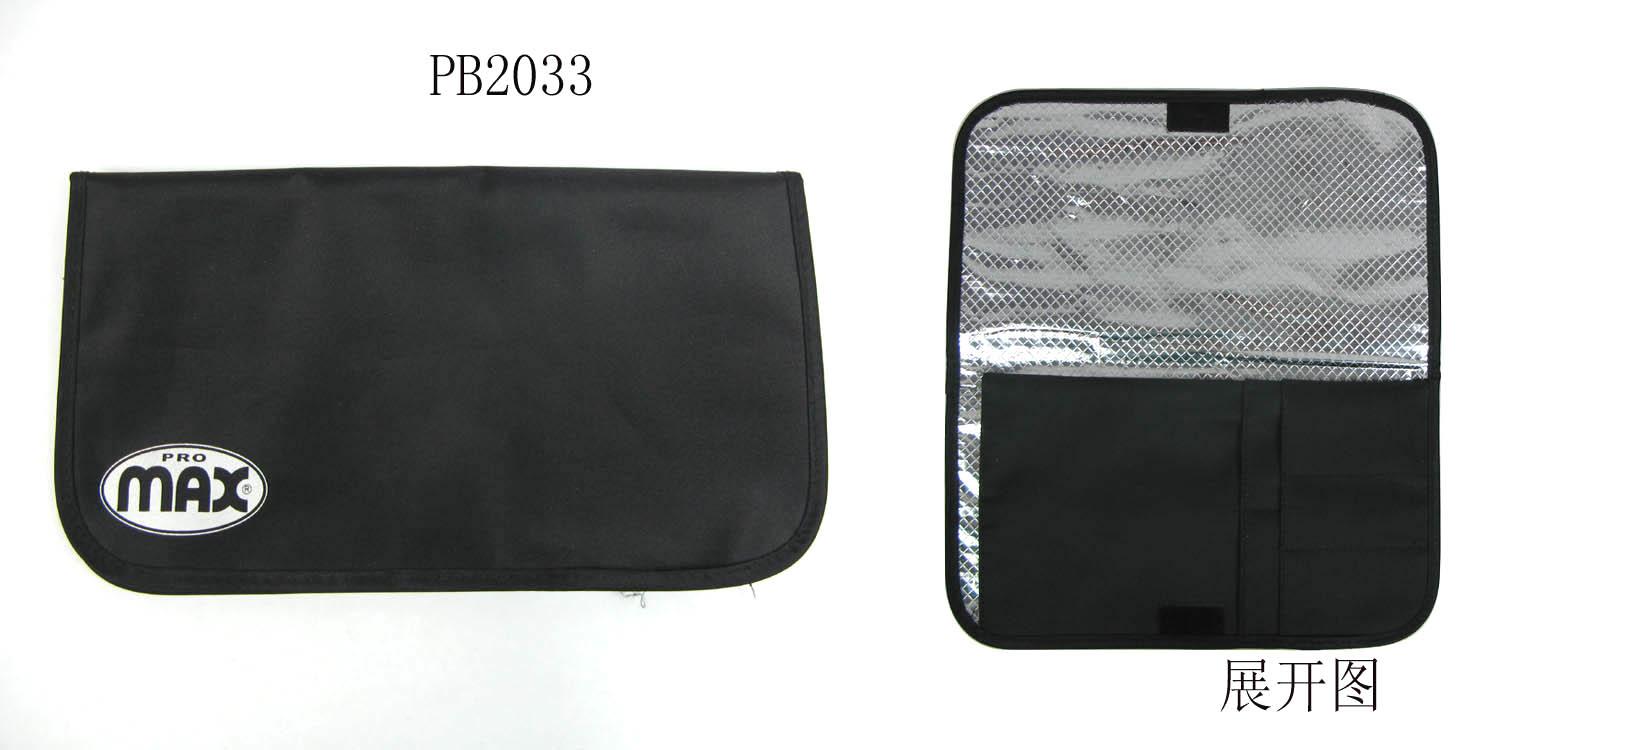 PB2033